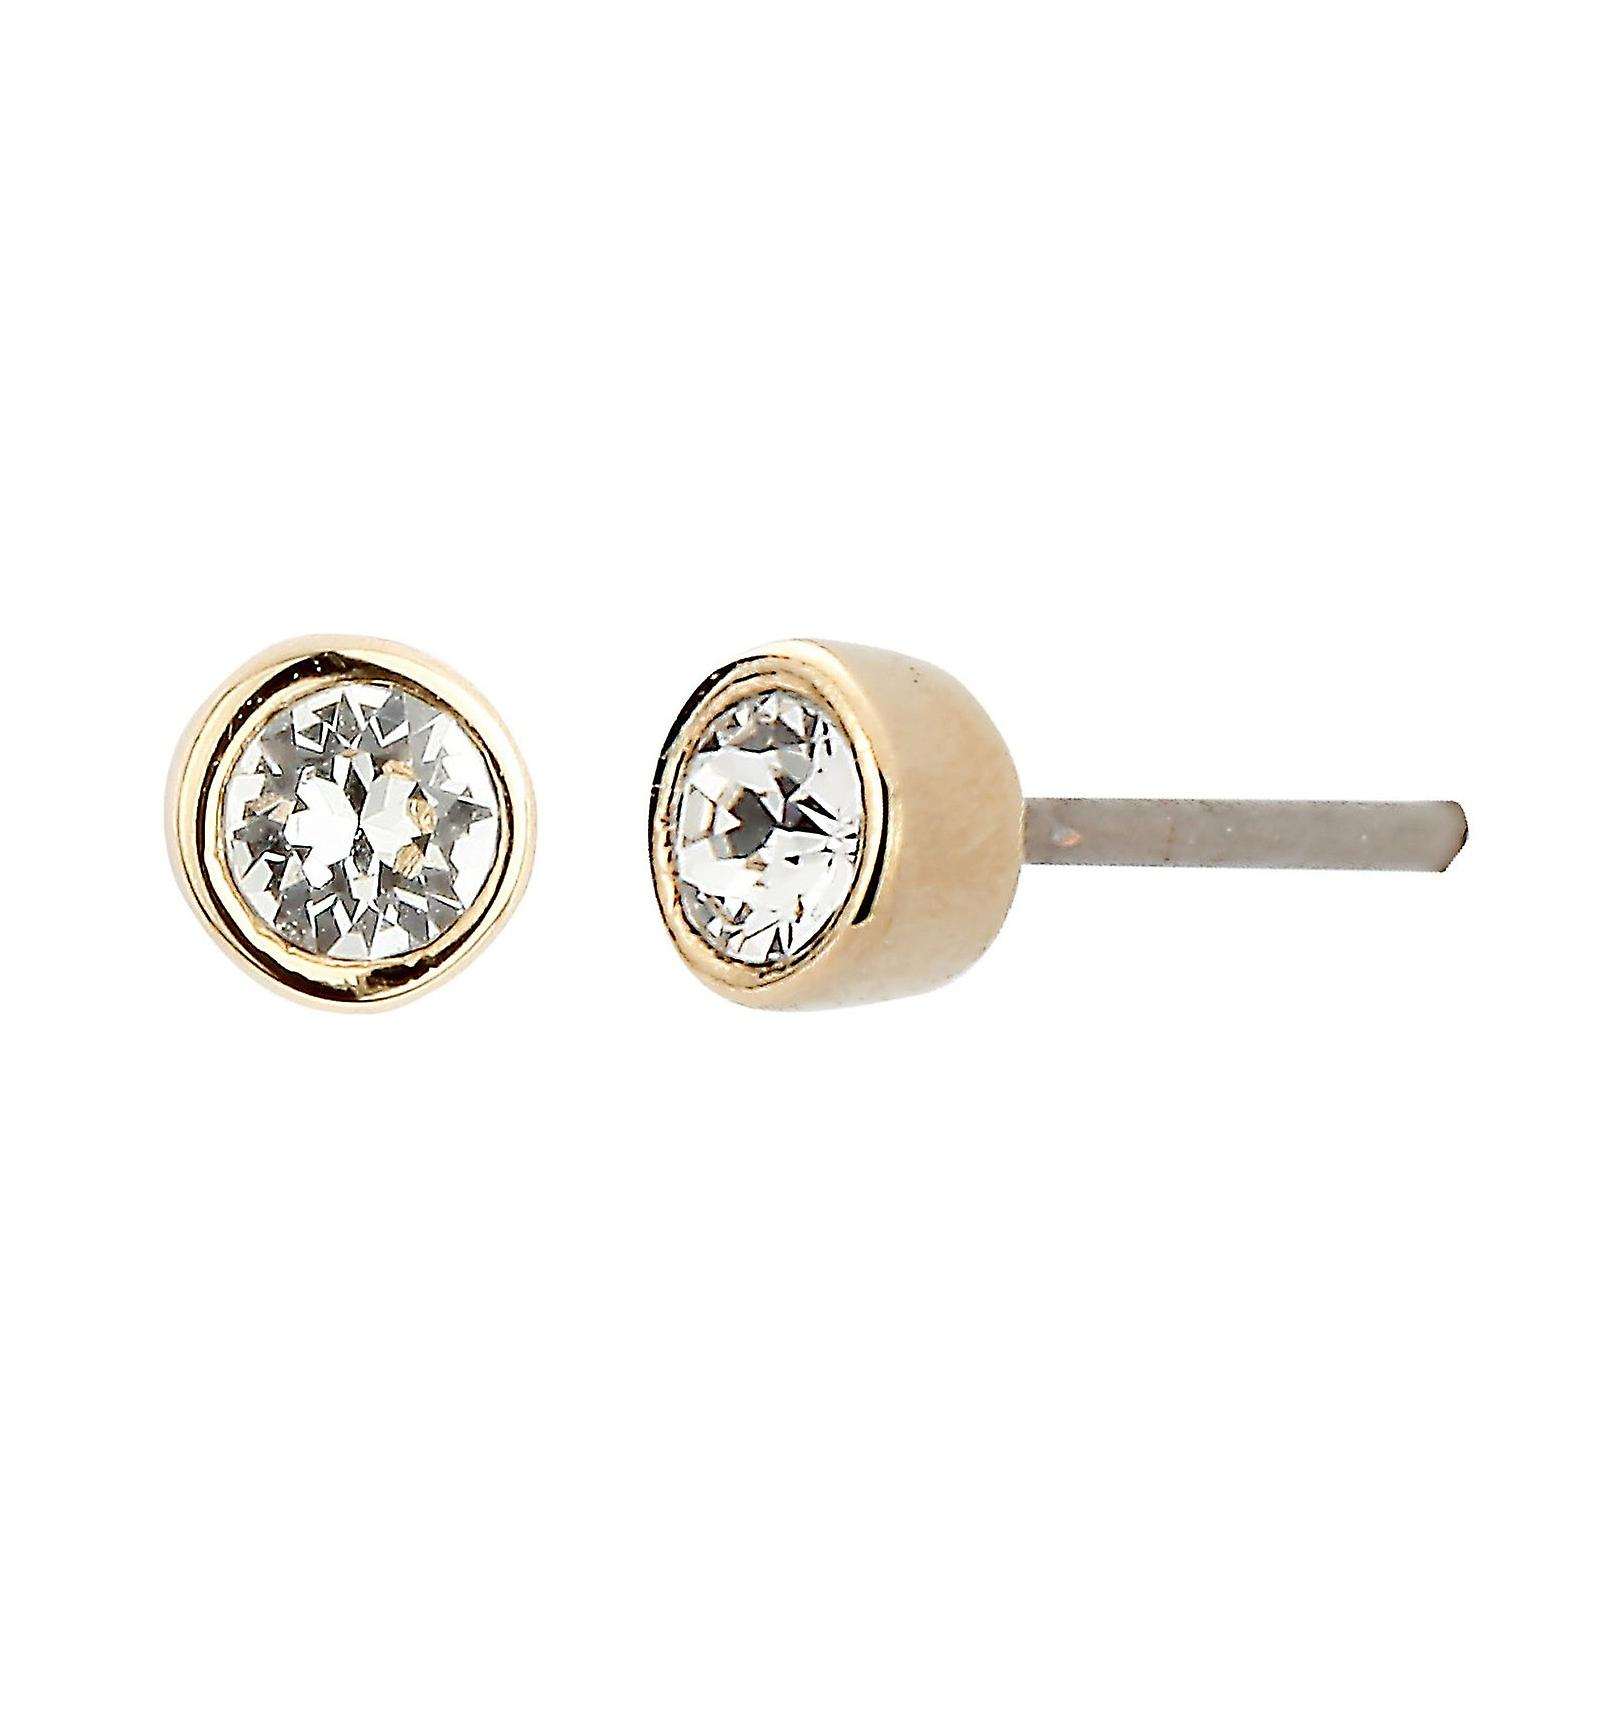 Traveller pierced earring - 22ct gold plated - Swarovski Crystal - 145596